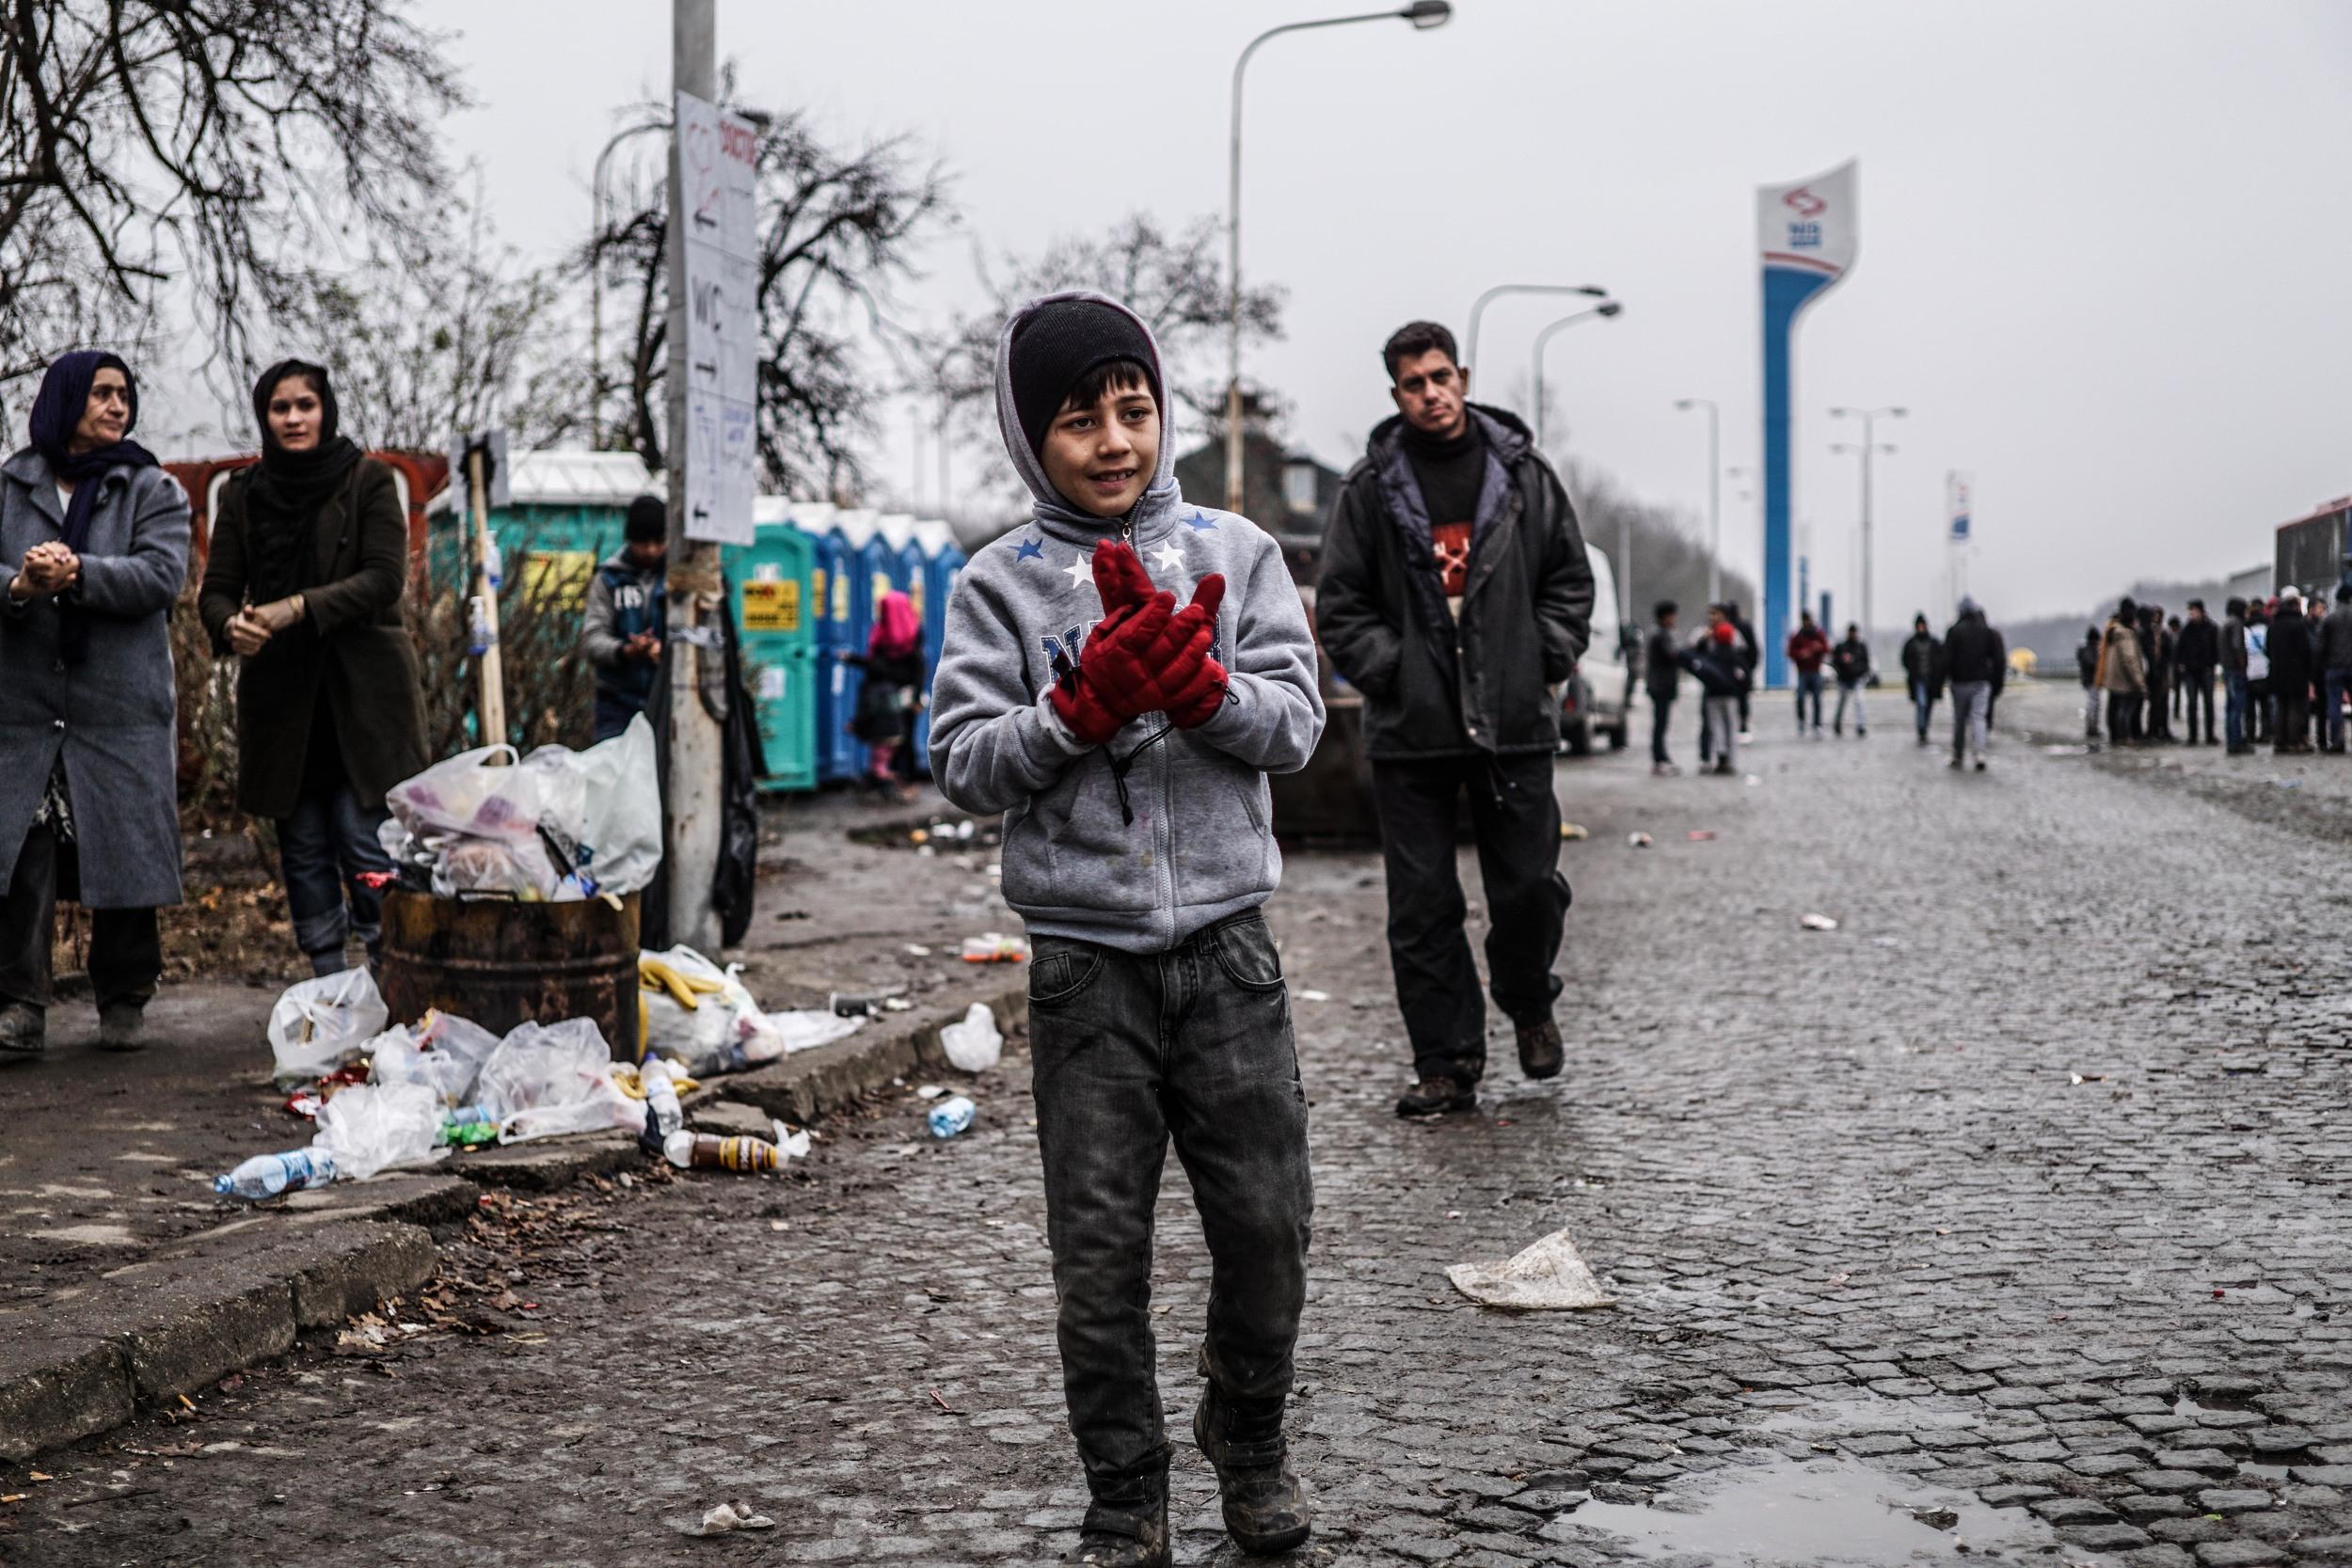 Syrian Refugee Crisis Serbia November 2015 7.jpg